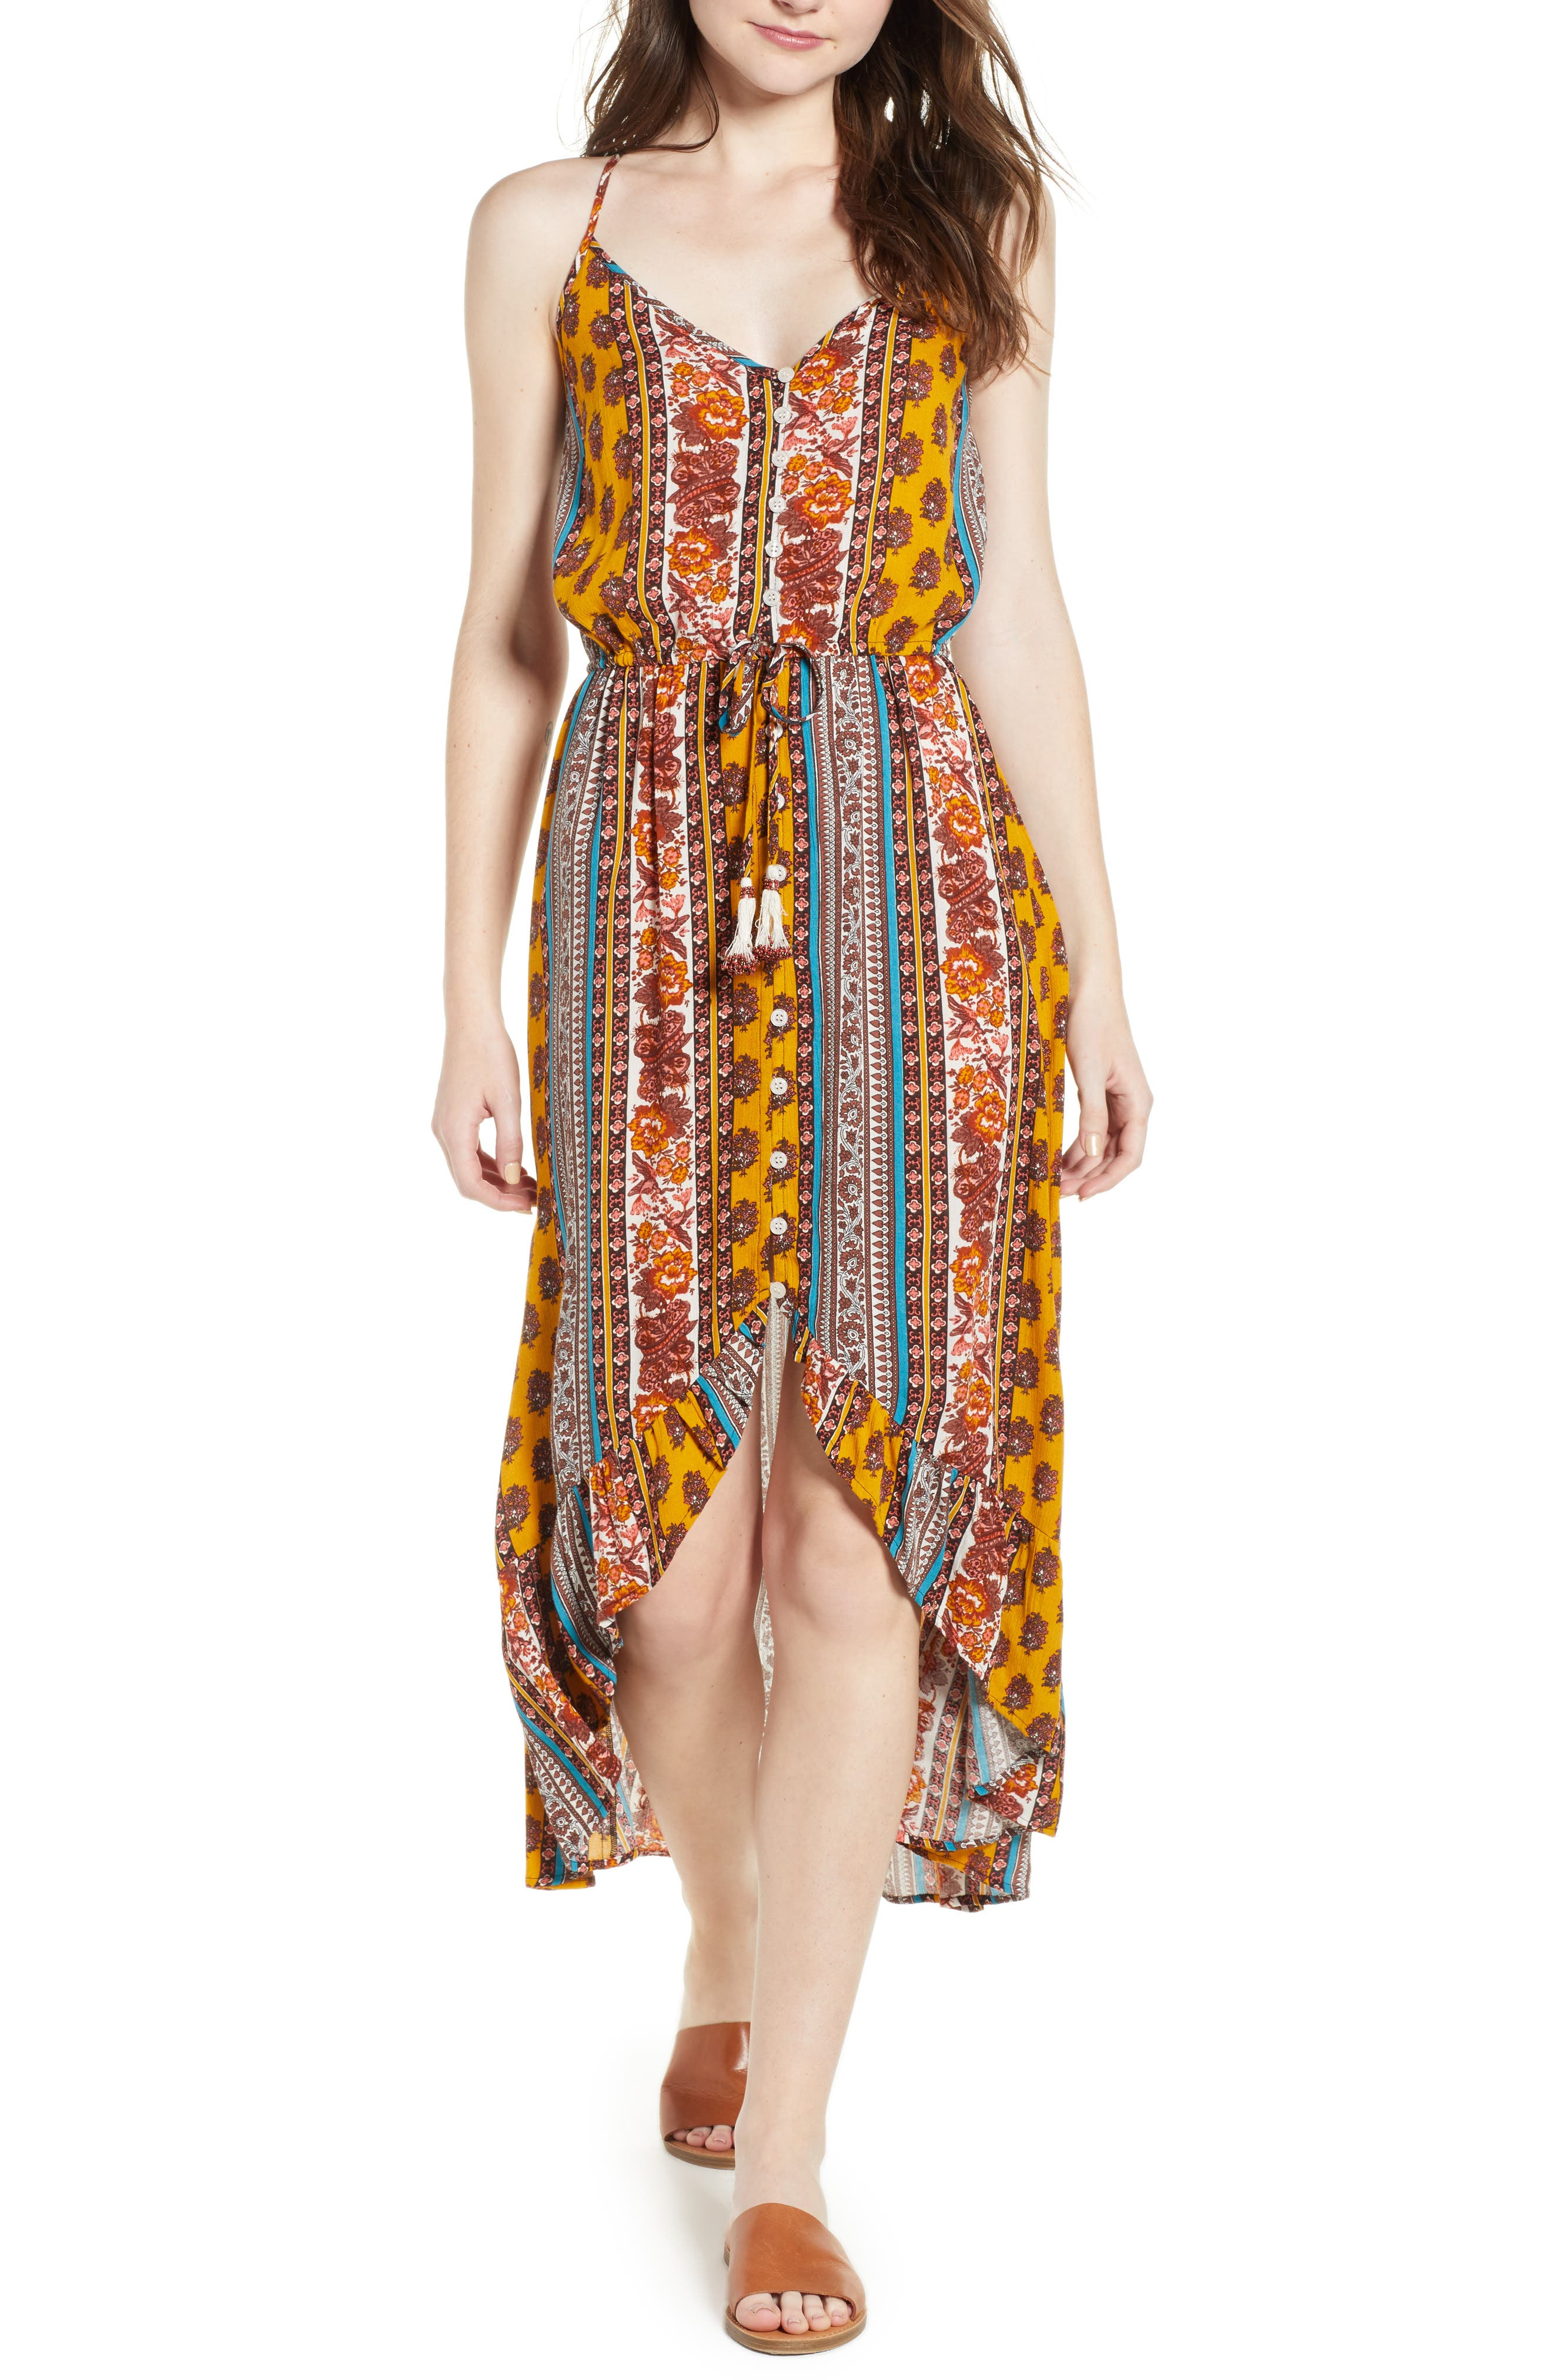 BAND OF GYPSIES Geo Stripe High/Low Dress, Main, color, 700